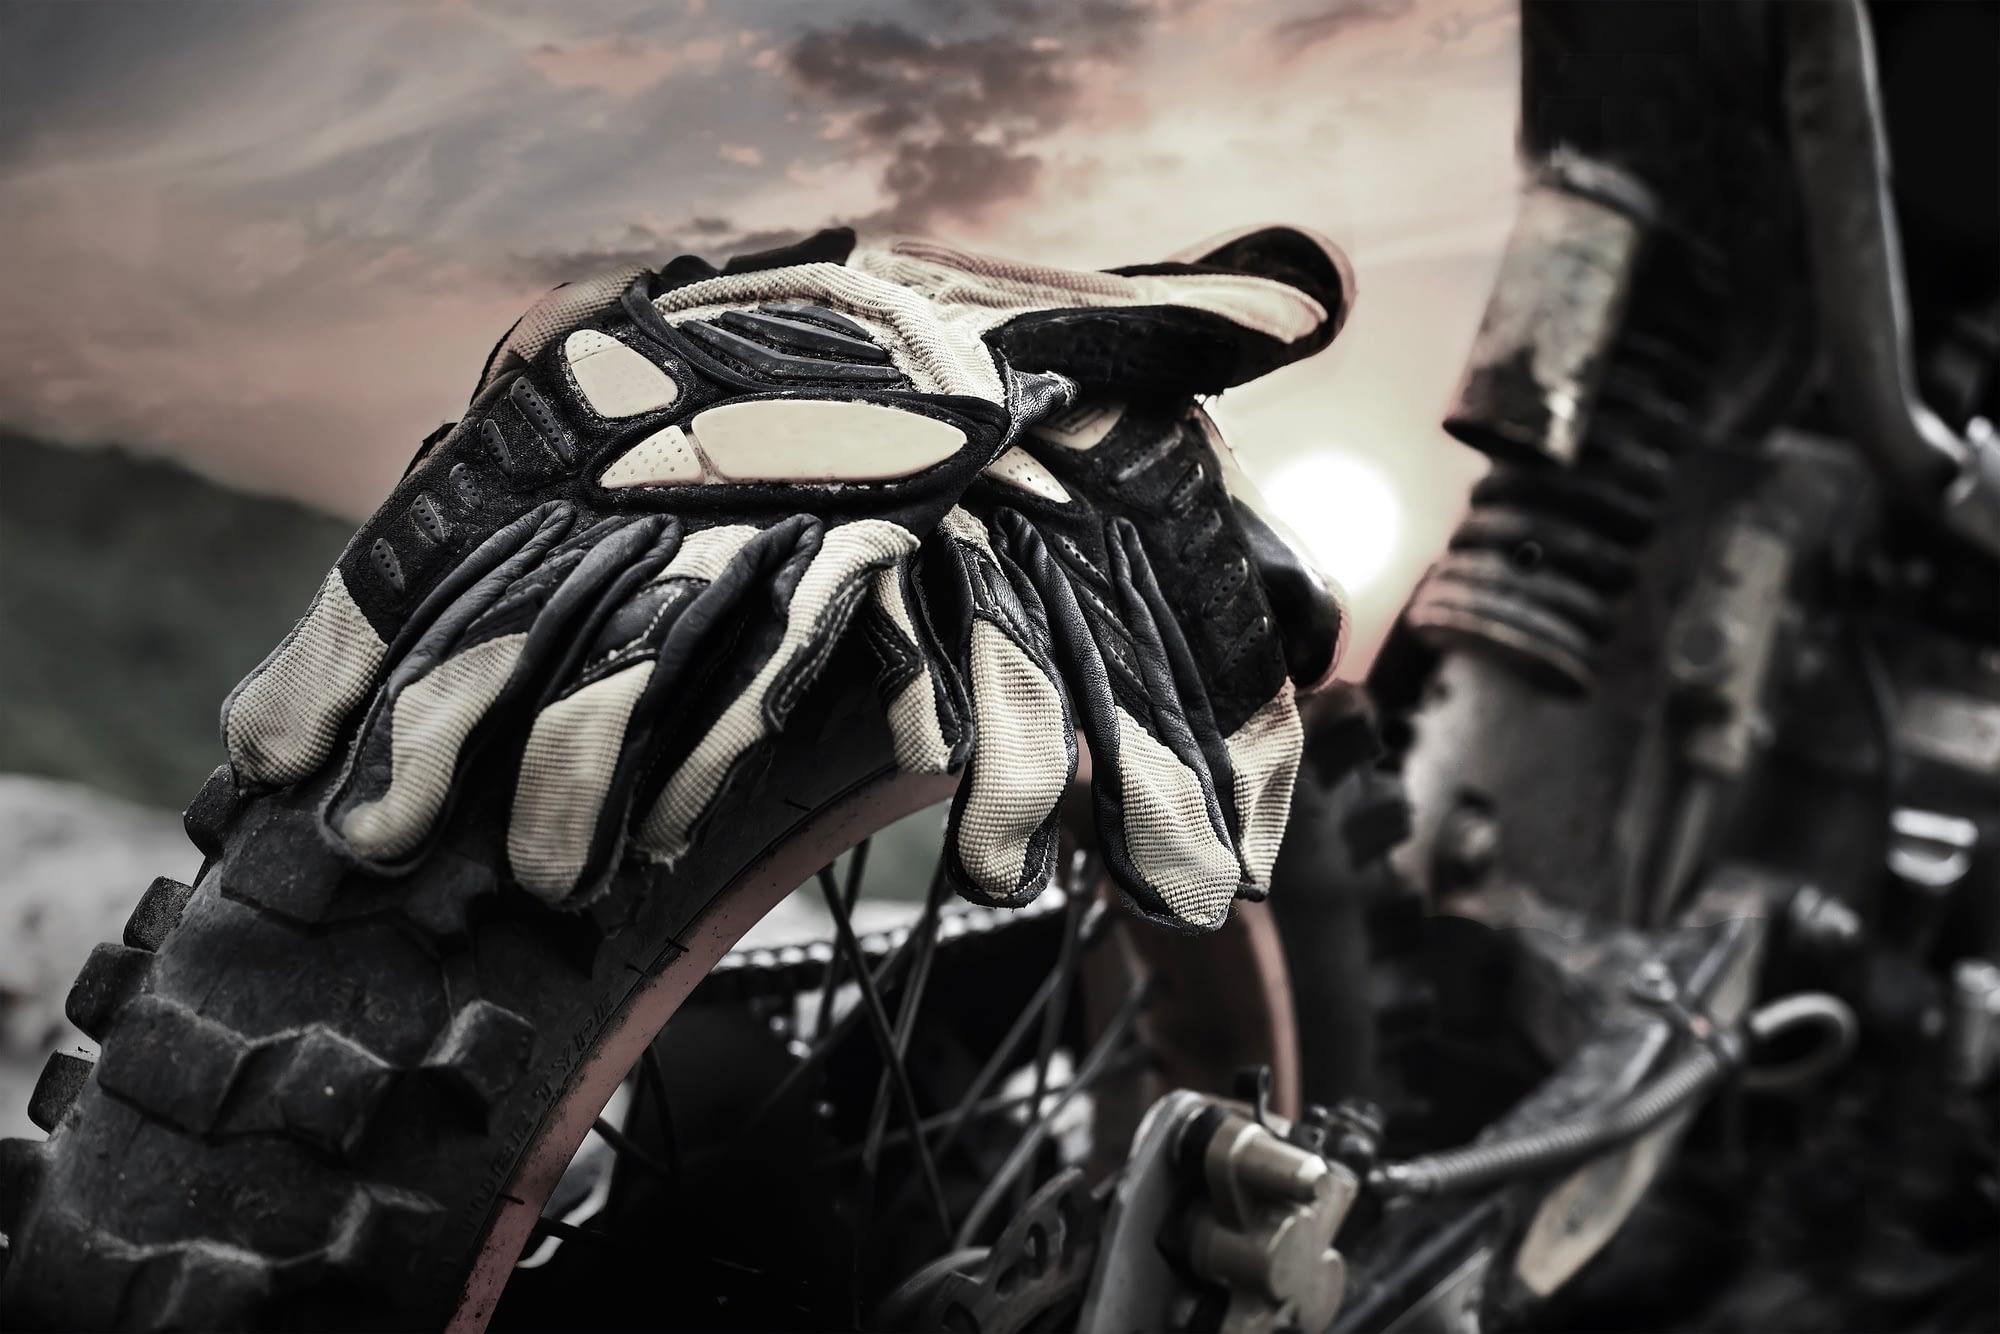 Наше дело Эндуро Краснодар zuum мотоциклы ремонт эндуро Купить zuum Официальный дилер zuum Купить zuum Краснодар - iStock 466743392 2 - Наше дело